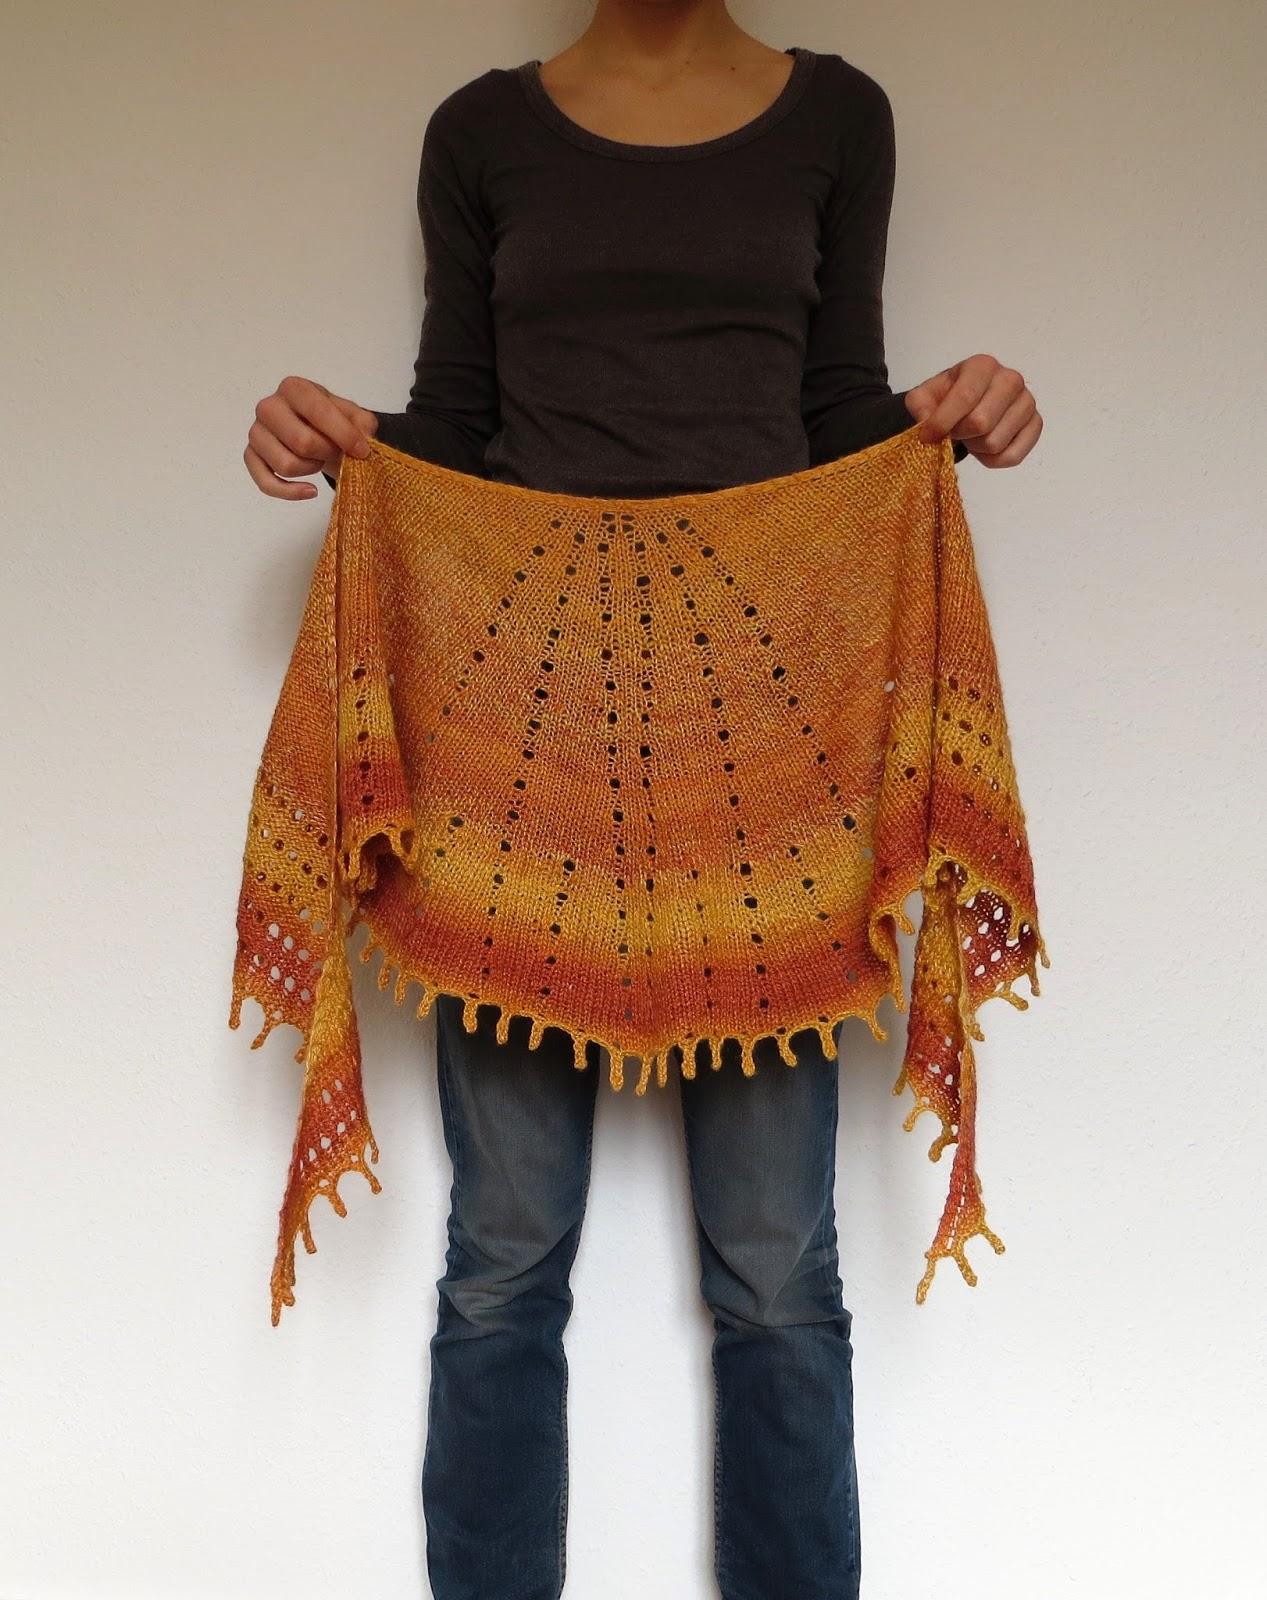 Dunkelgrün Wool&Fibers: